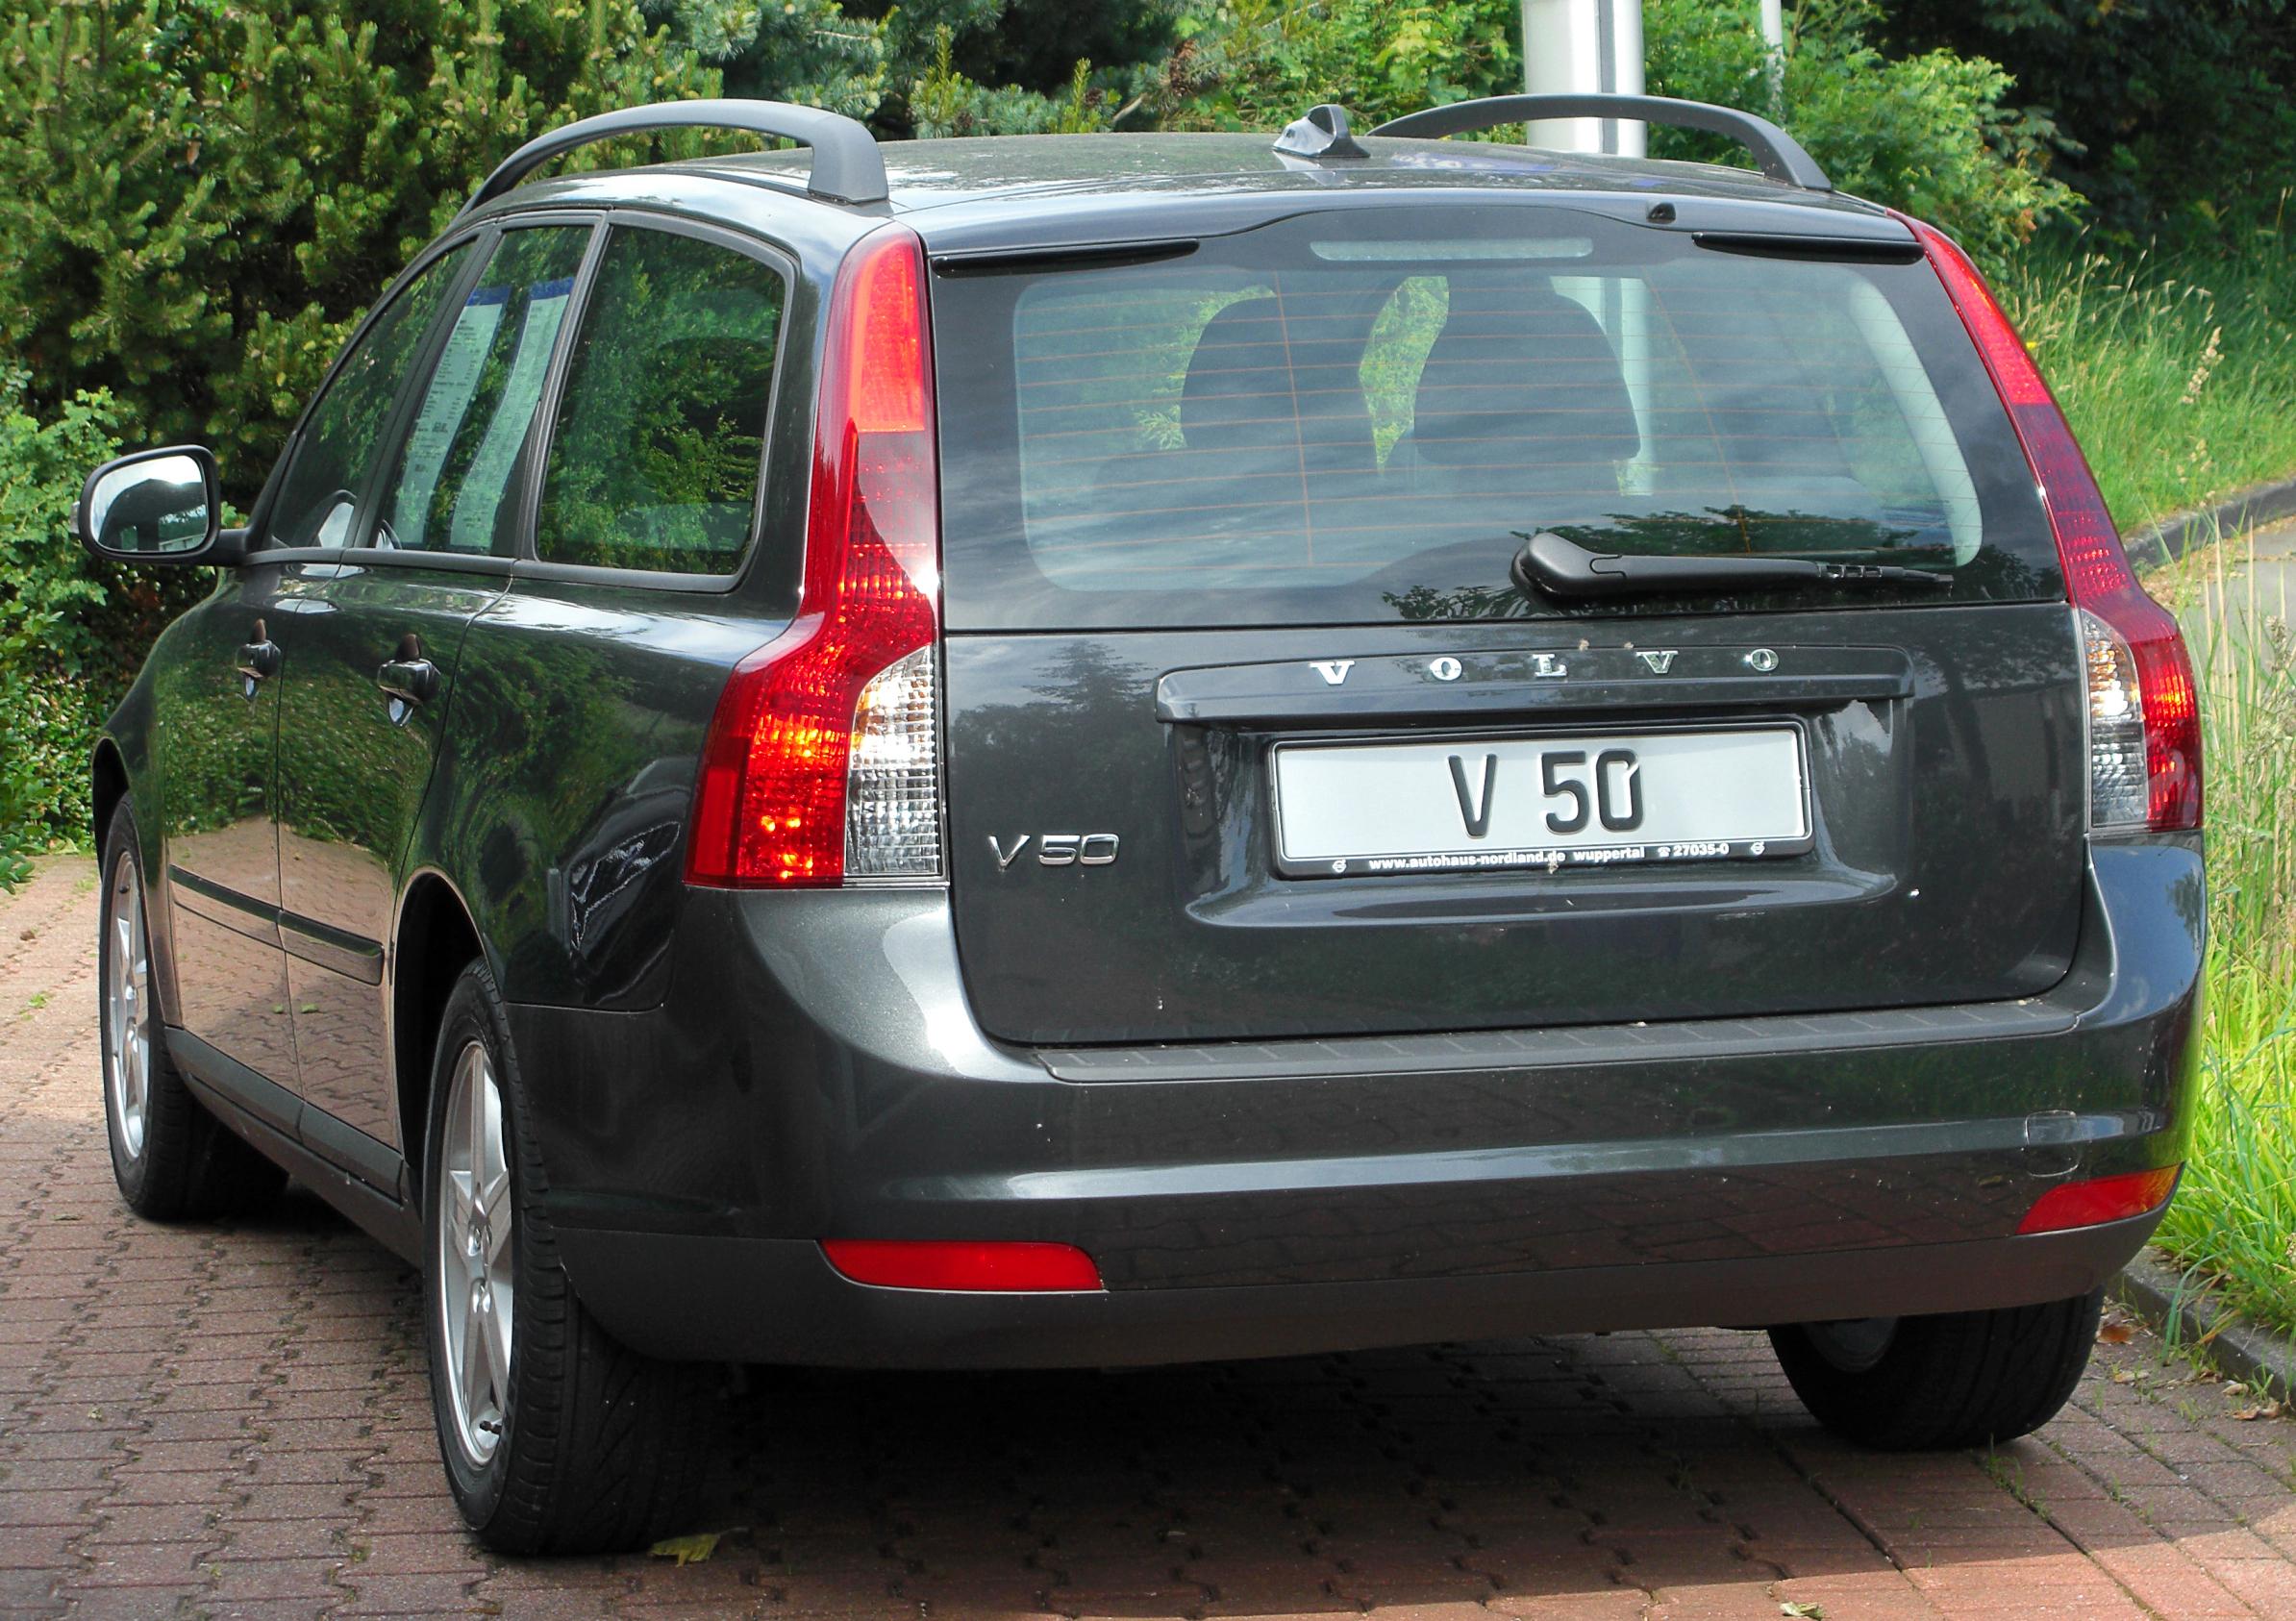 Volvo V 50 2.0 D